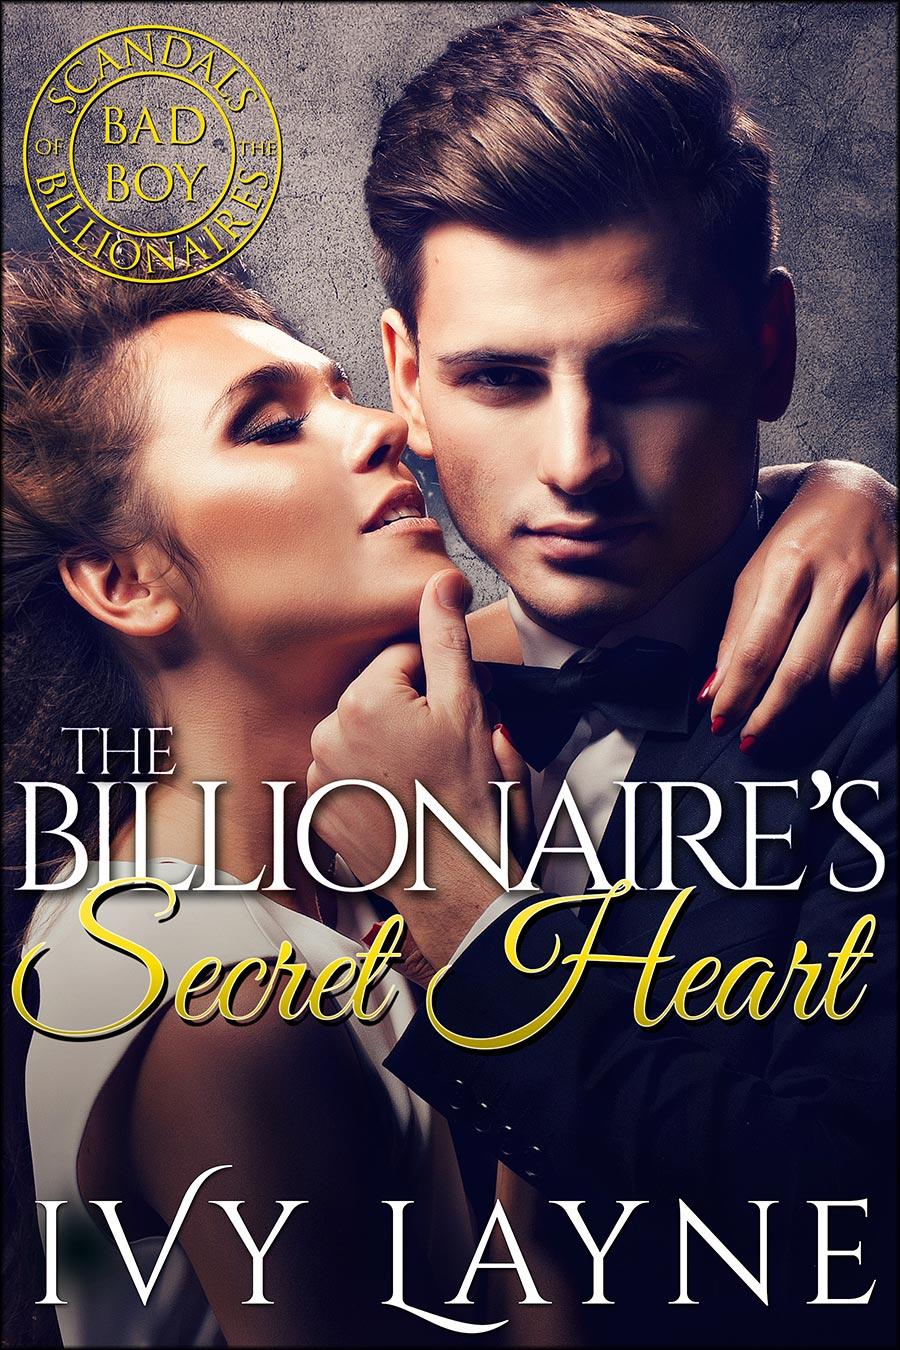 The-Billionaires-Secret-Heart---Ivy-Layne---no-alexa.jpg